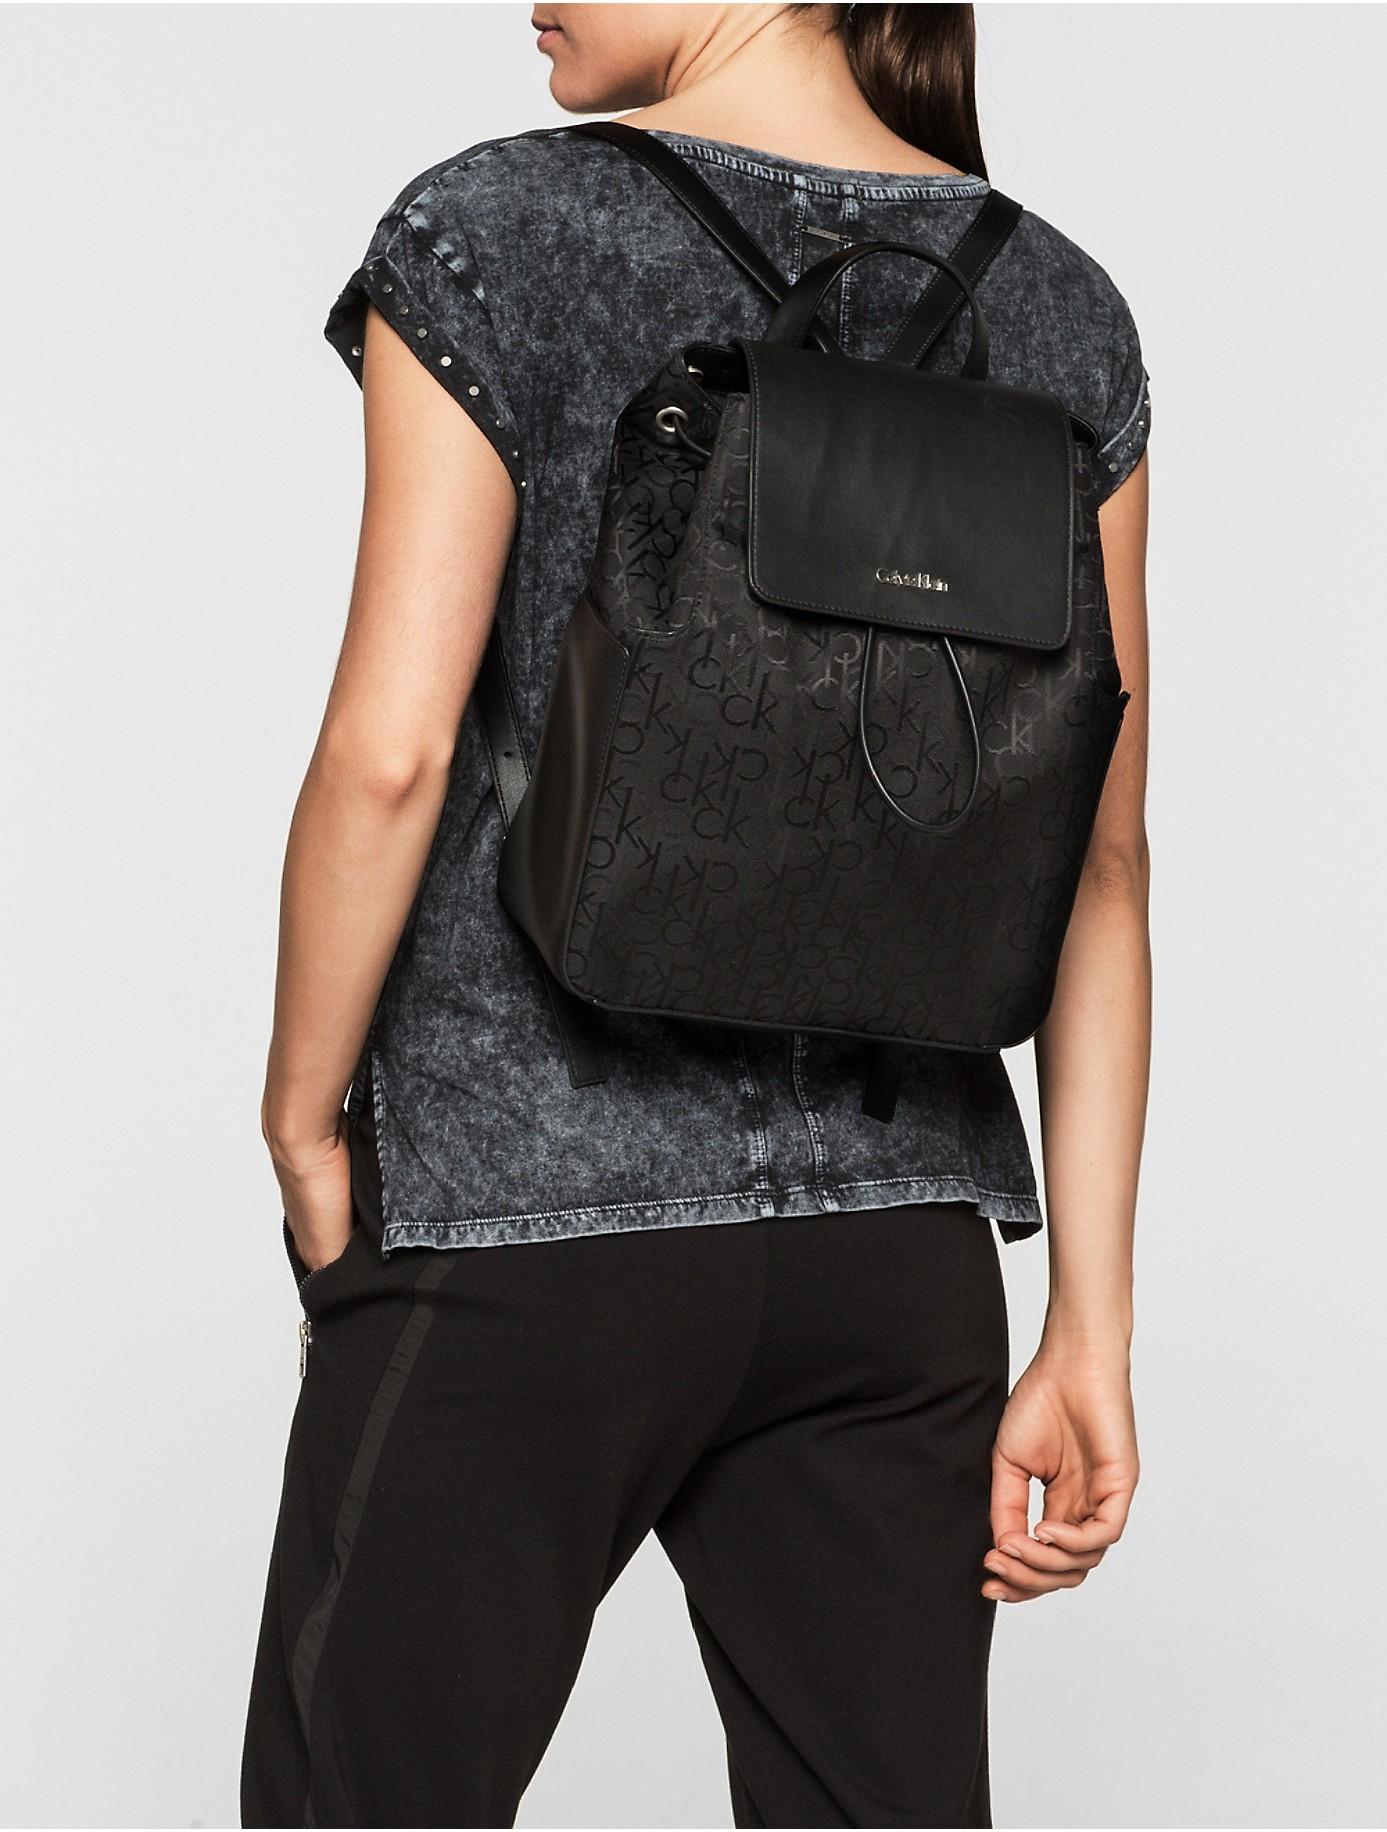 Tempat Jual Lc020 Longchamp Le Pliage Neo Fantaisie Medium Terbaru Backpack M Merah Lyst Calvin Klein Jeans Nina Logo In Black